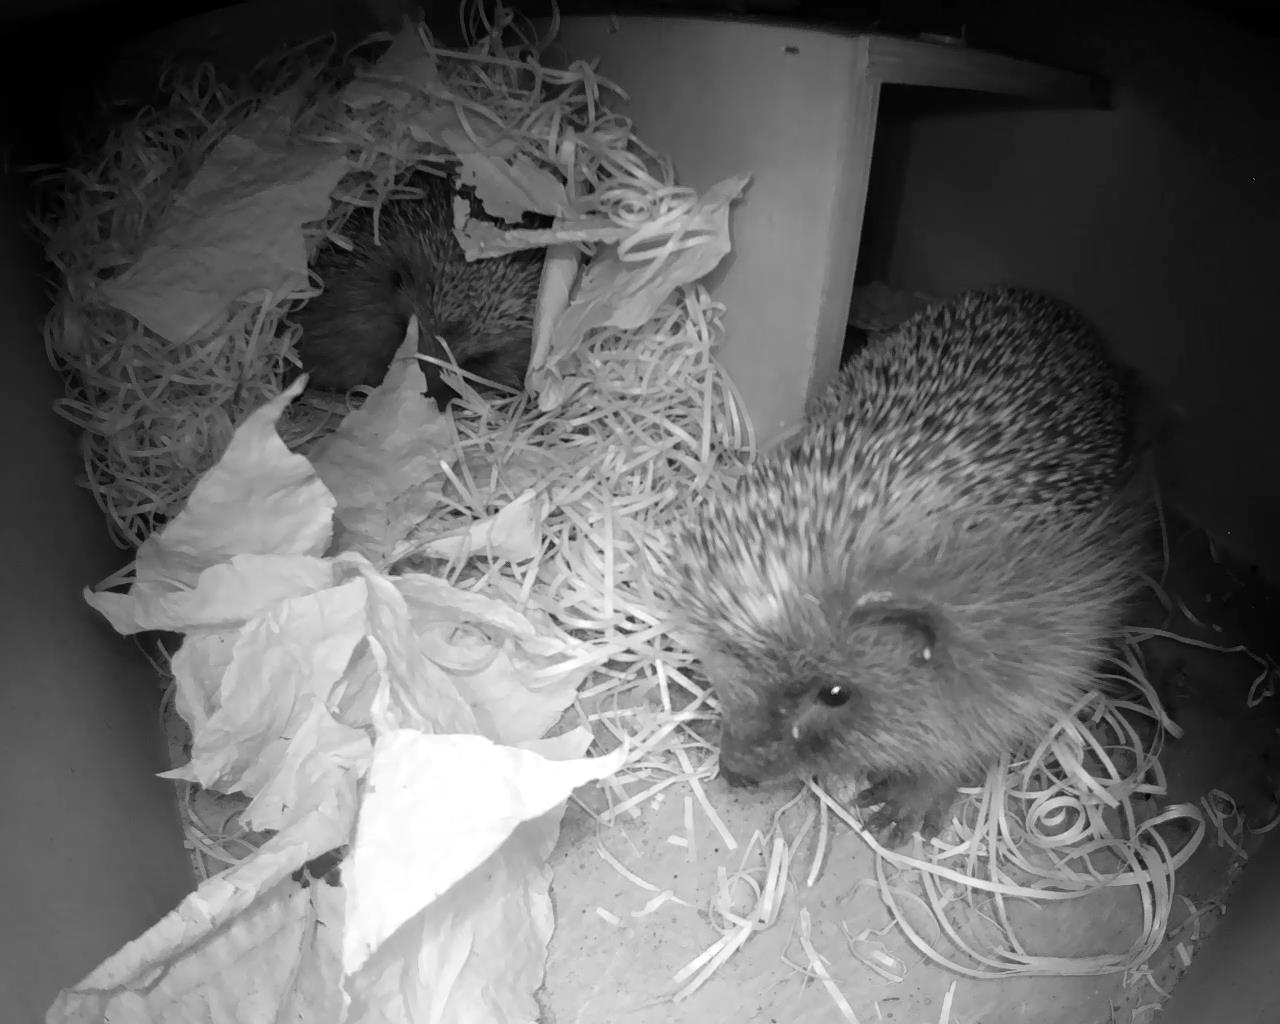 Hedgehog Box 2016-04-28 21-54-31.297